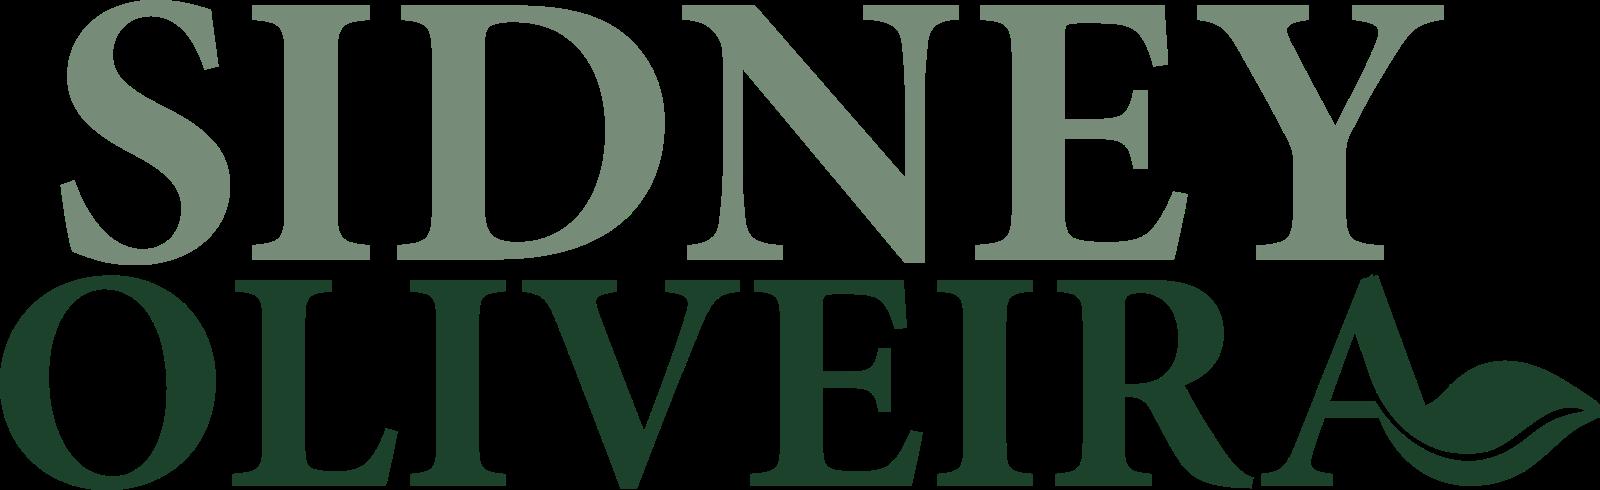 sidney oliveira logo 2 - Sidney Oliveira Logo